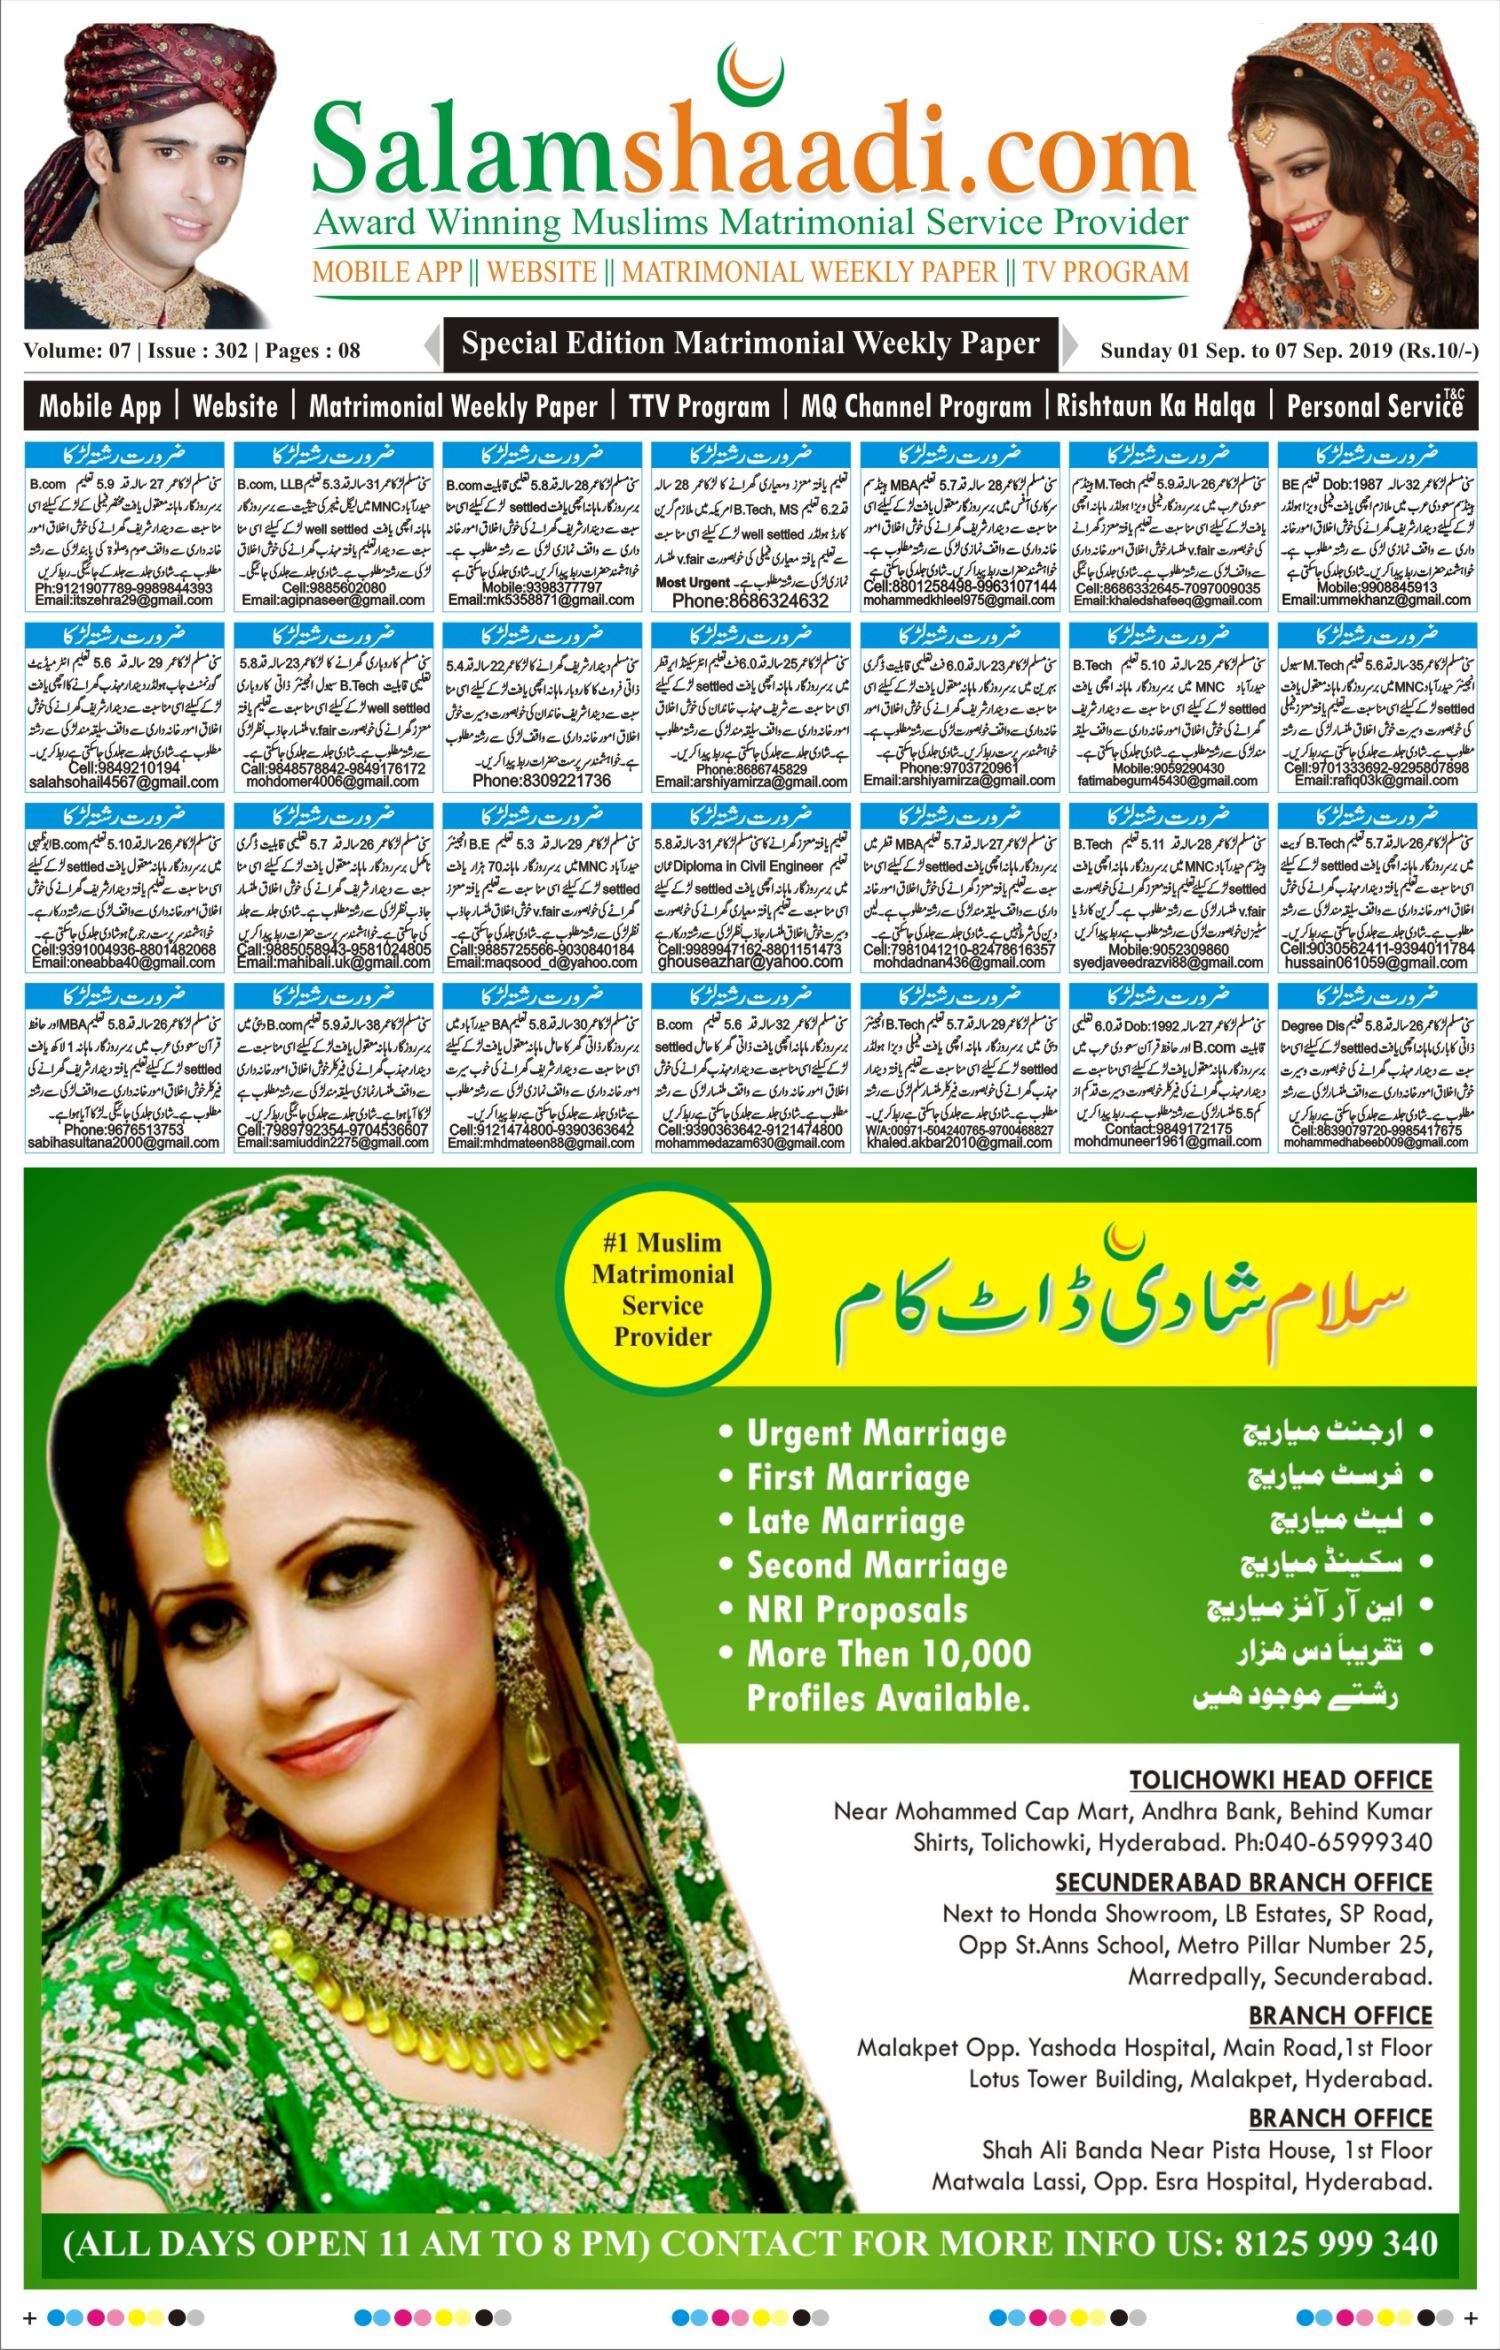 Salam Shaadi | 01 Sep 2019 to 07 Sep 2019 Online Matrimonial